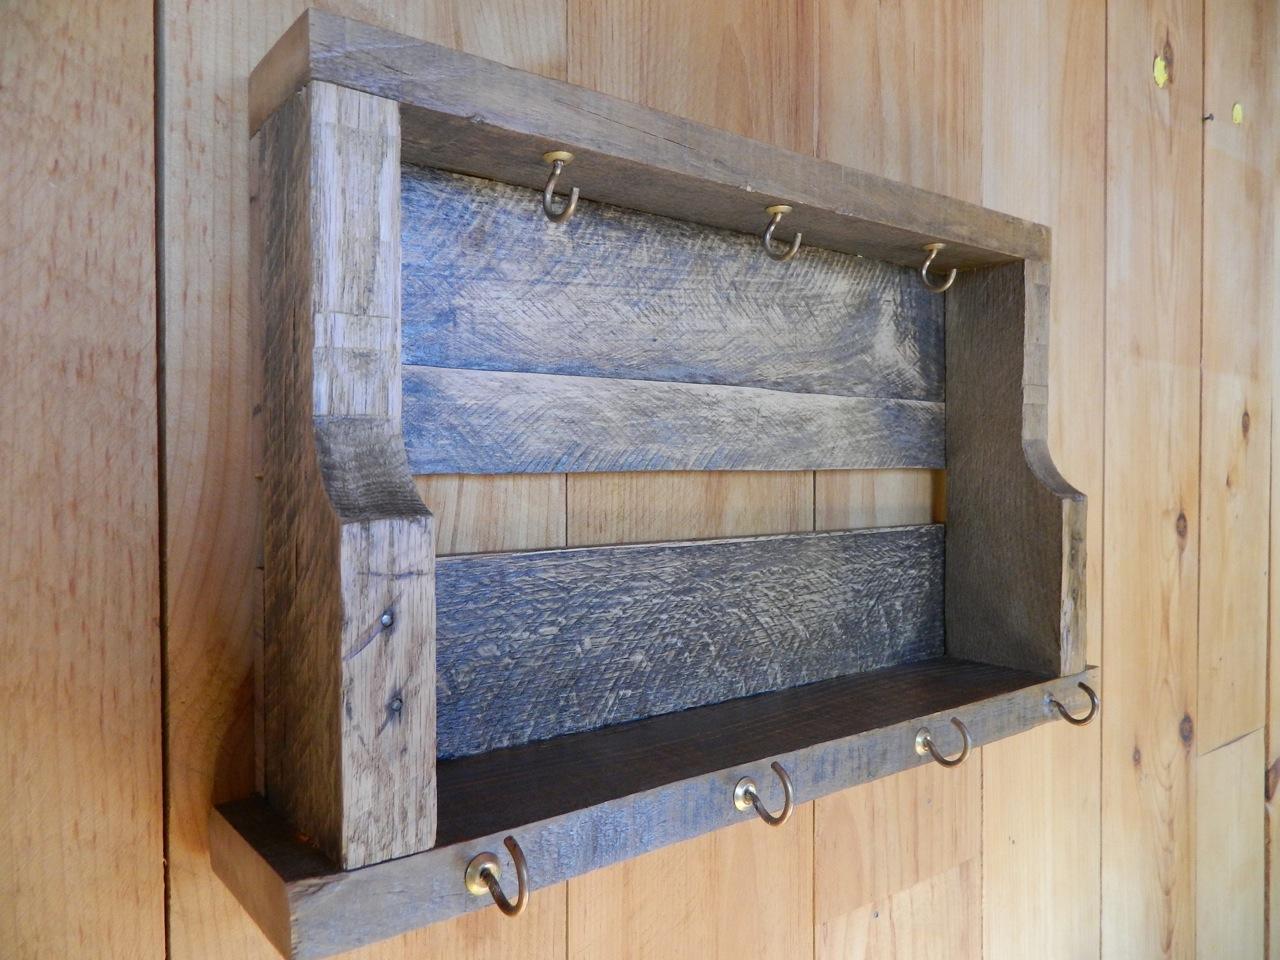 mug rack or coat rack or key rack or